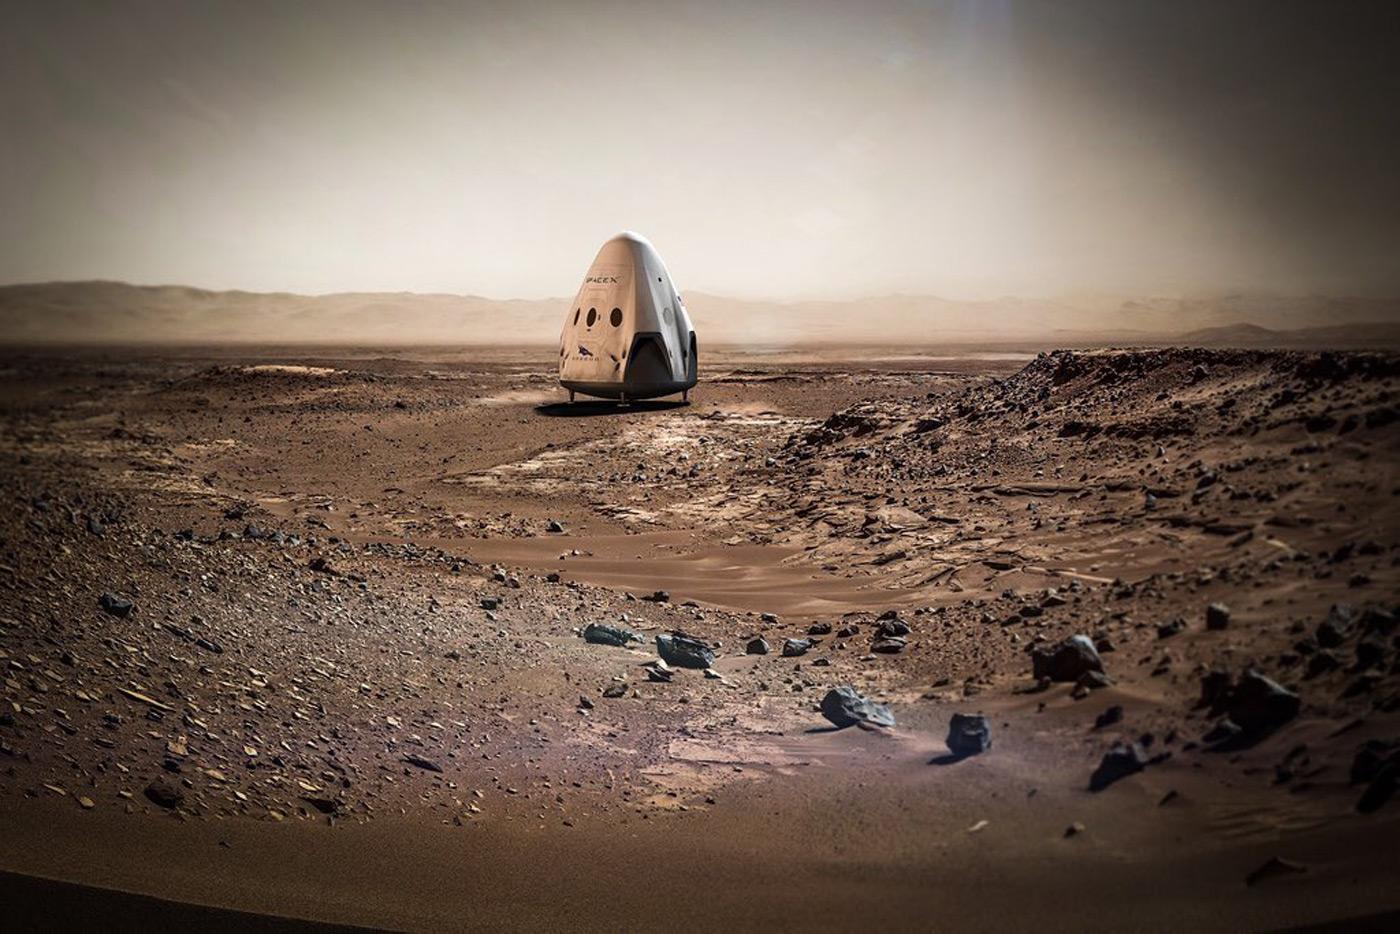 SpaceX 的 Dragon 无人太空船可能最早在 2018 年登陆火星